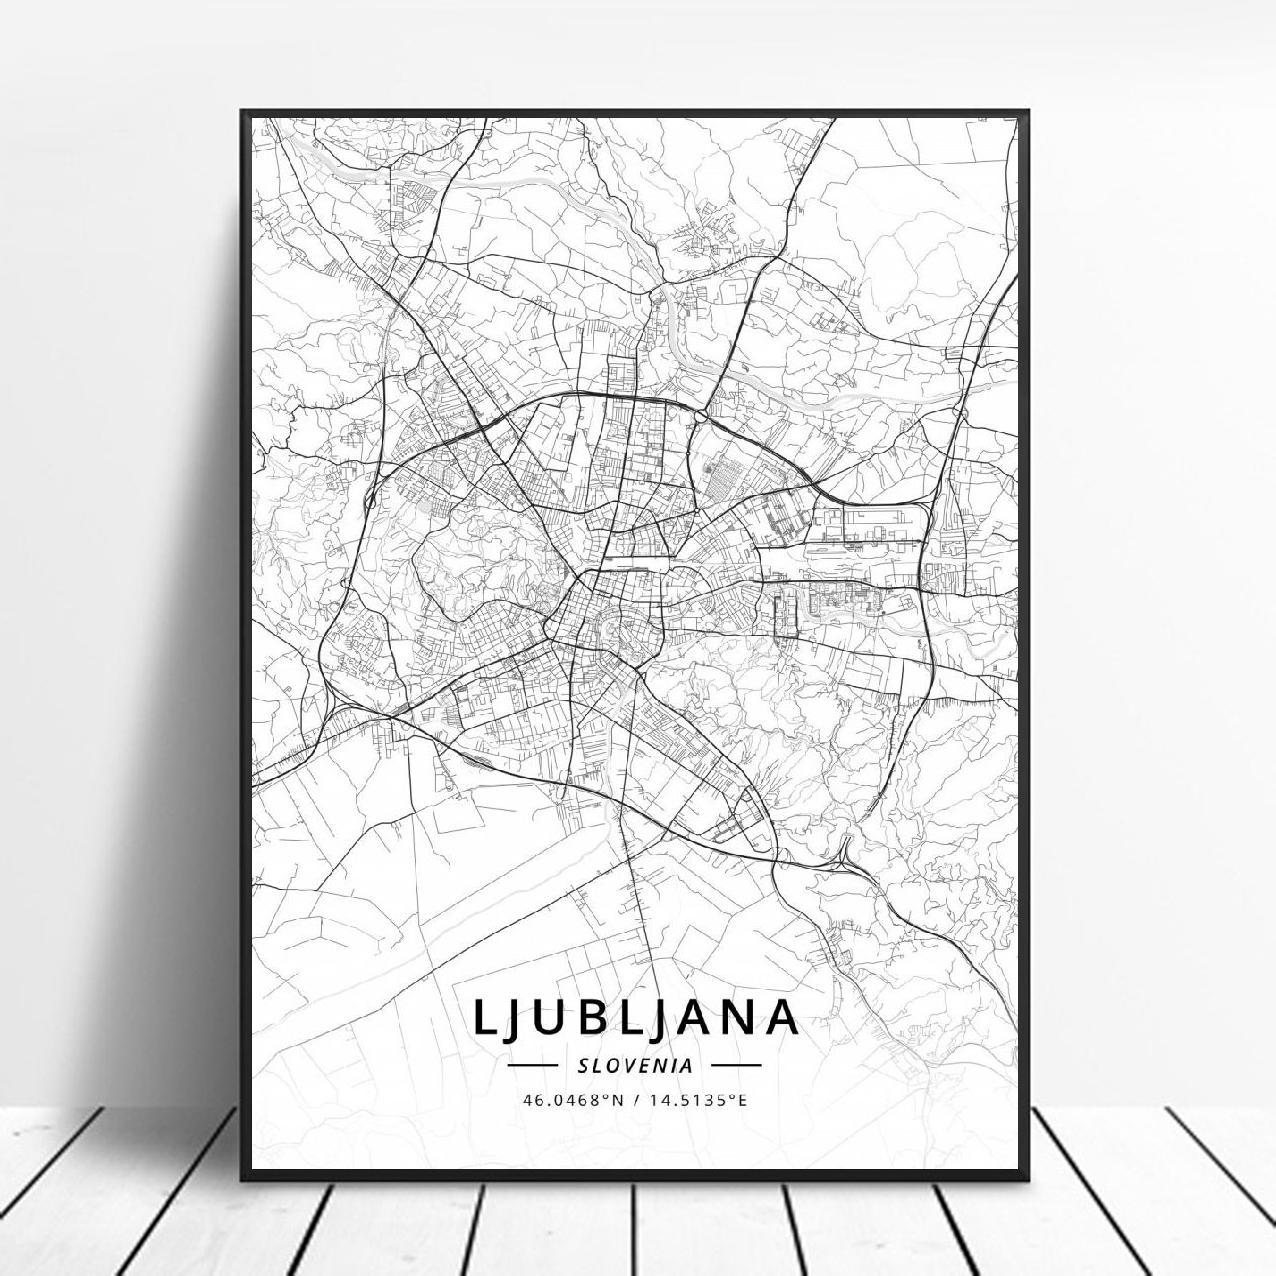 Ljubljana Maribor Slovenia  Canvas Art Map Poster